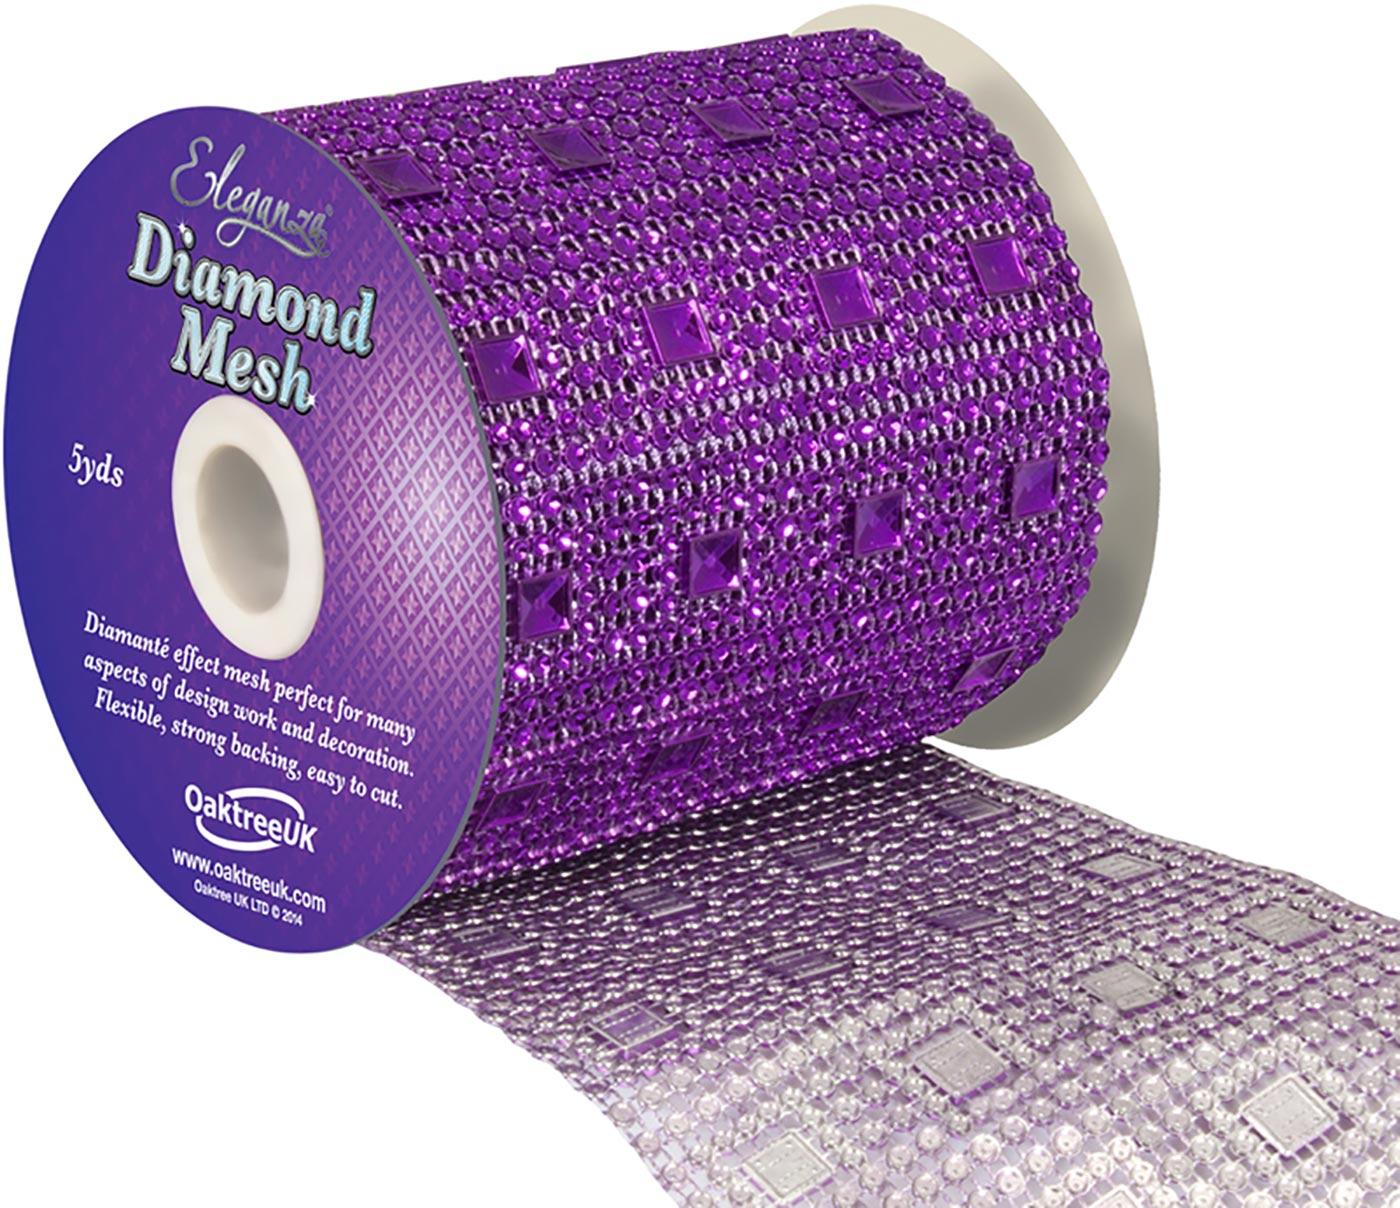 Eleganza Diamond Mesh 11cm x 4.5m Pattern No.351 Purple